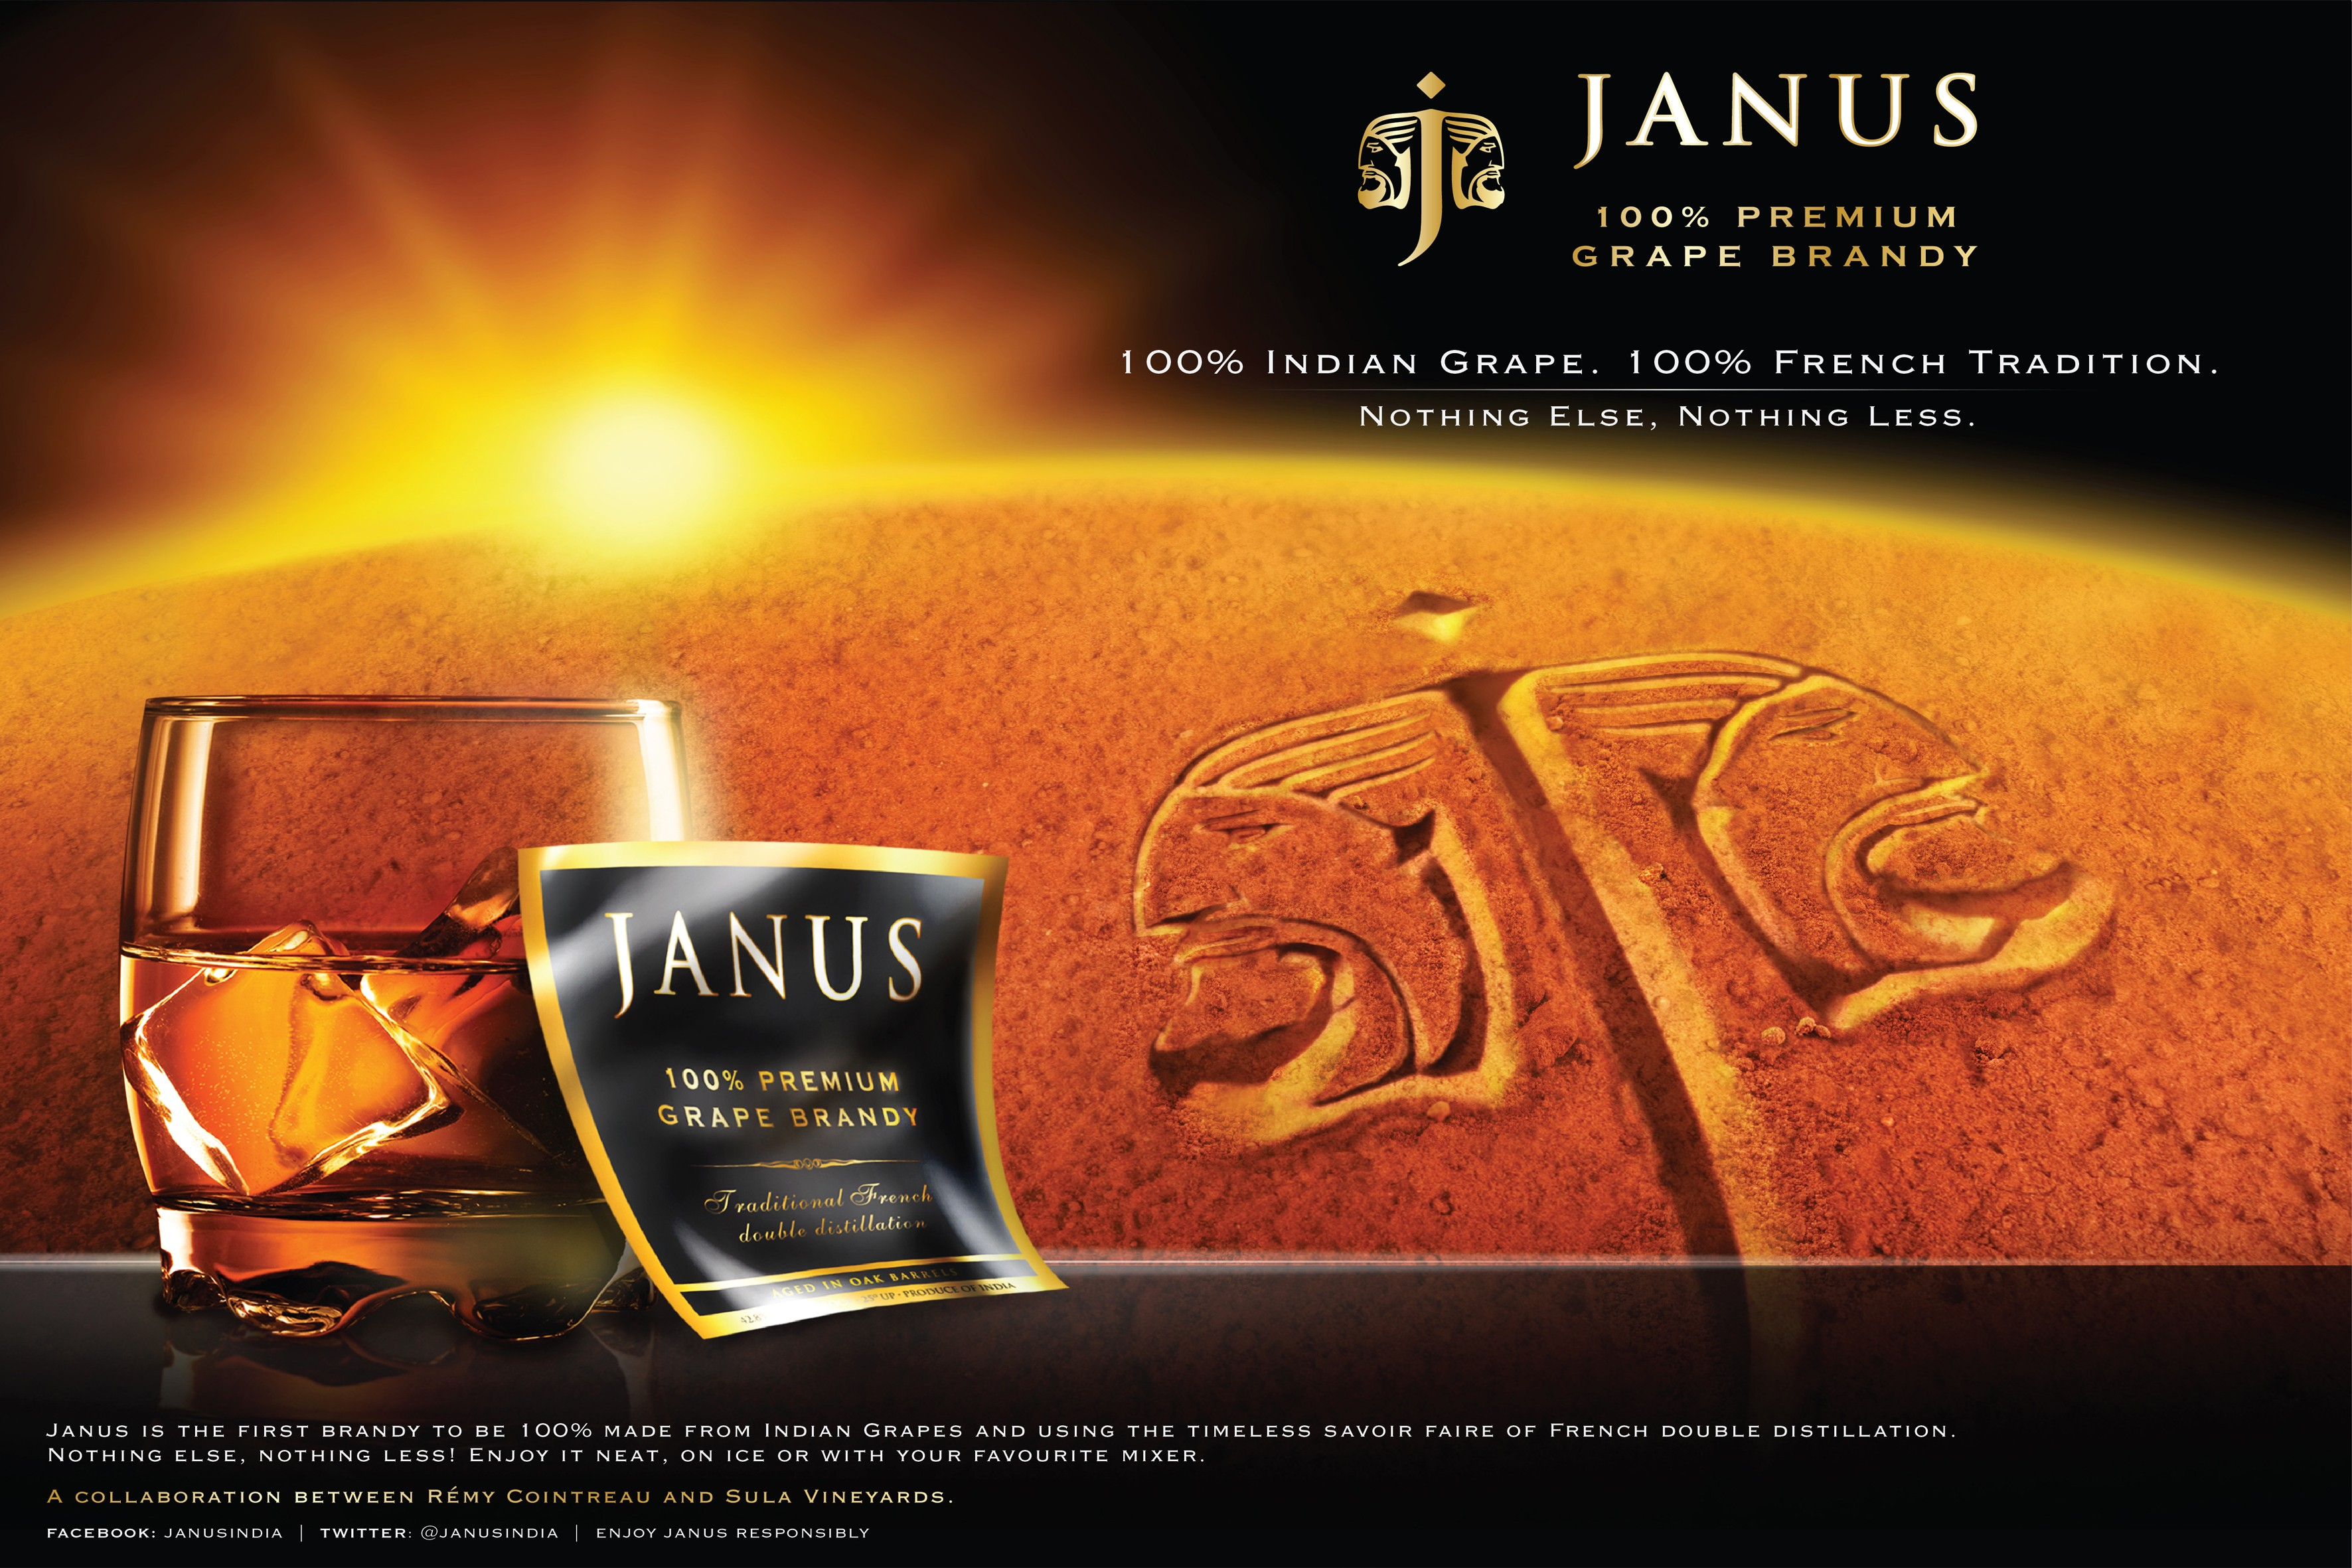 Sula Vineyards Janus image slider 2